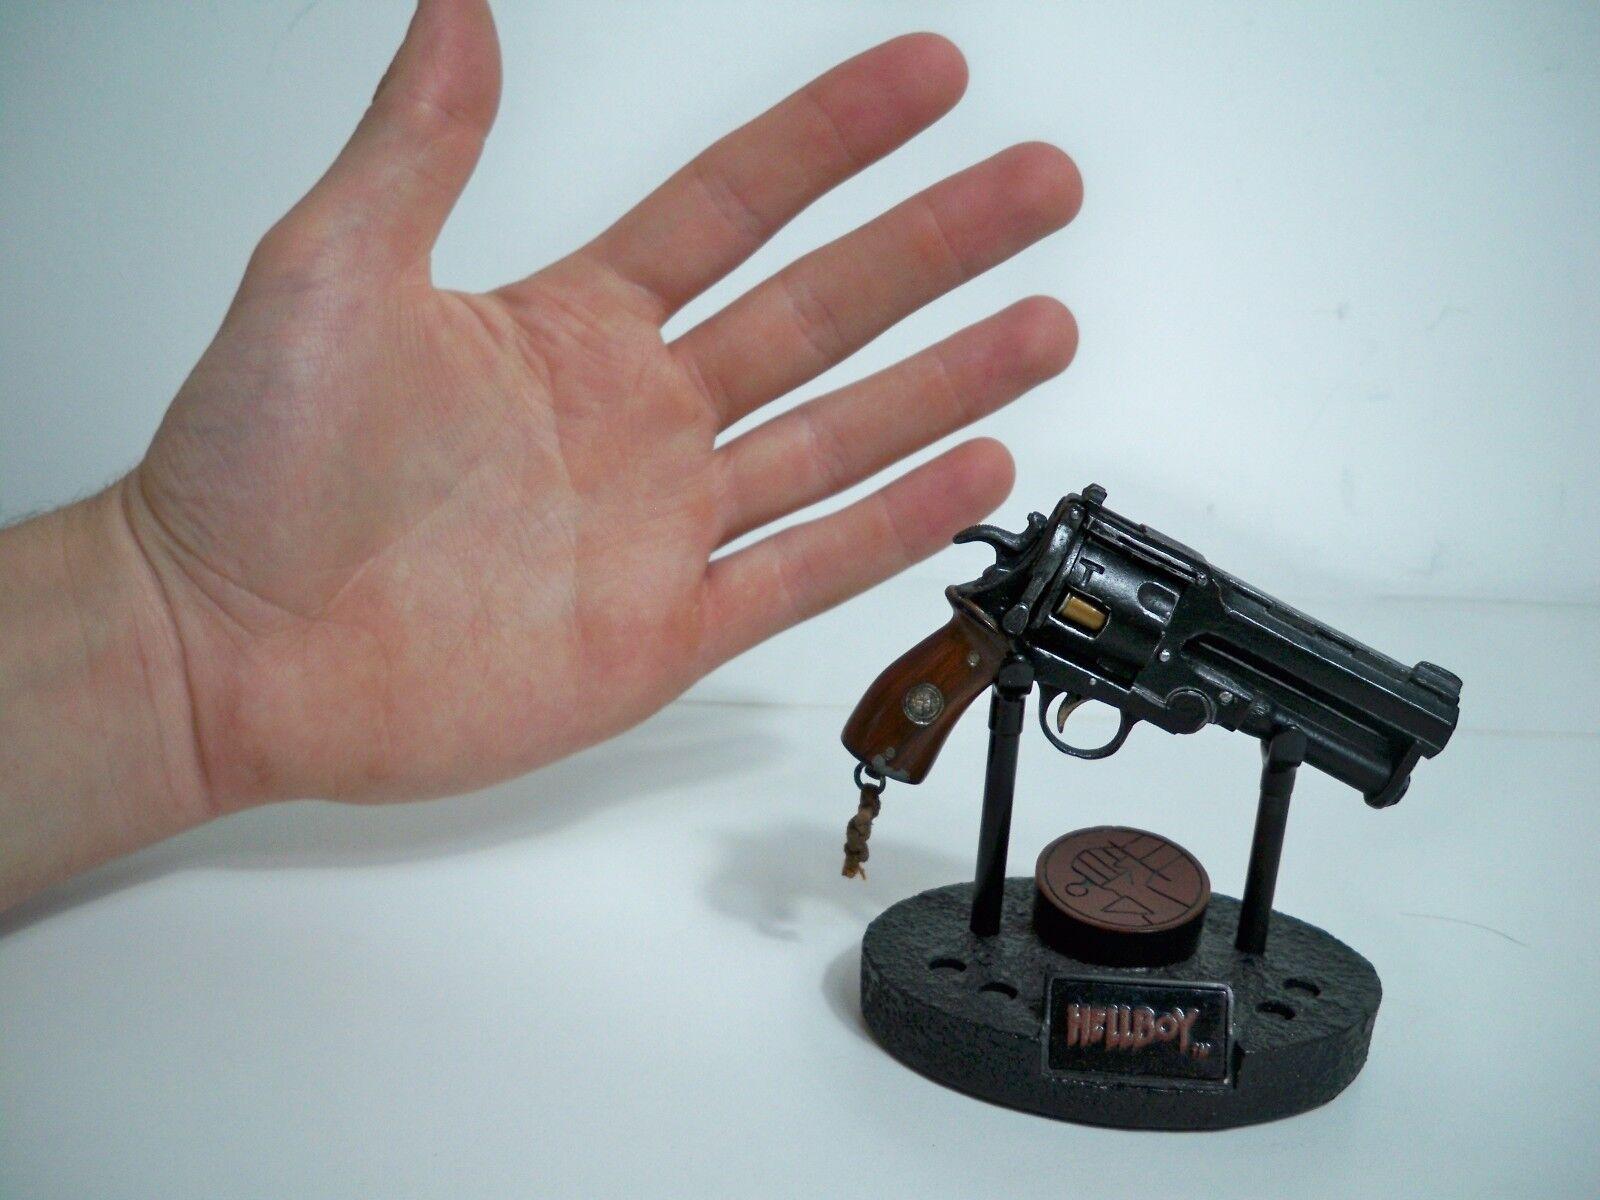 D1007132 escala 1 4 1 4 Samaritano Hellboy SIDESHOW COLLECTIBLES Menta en caja